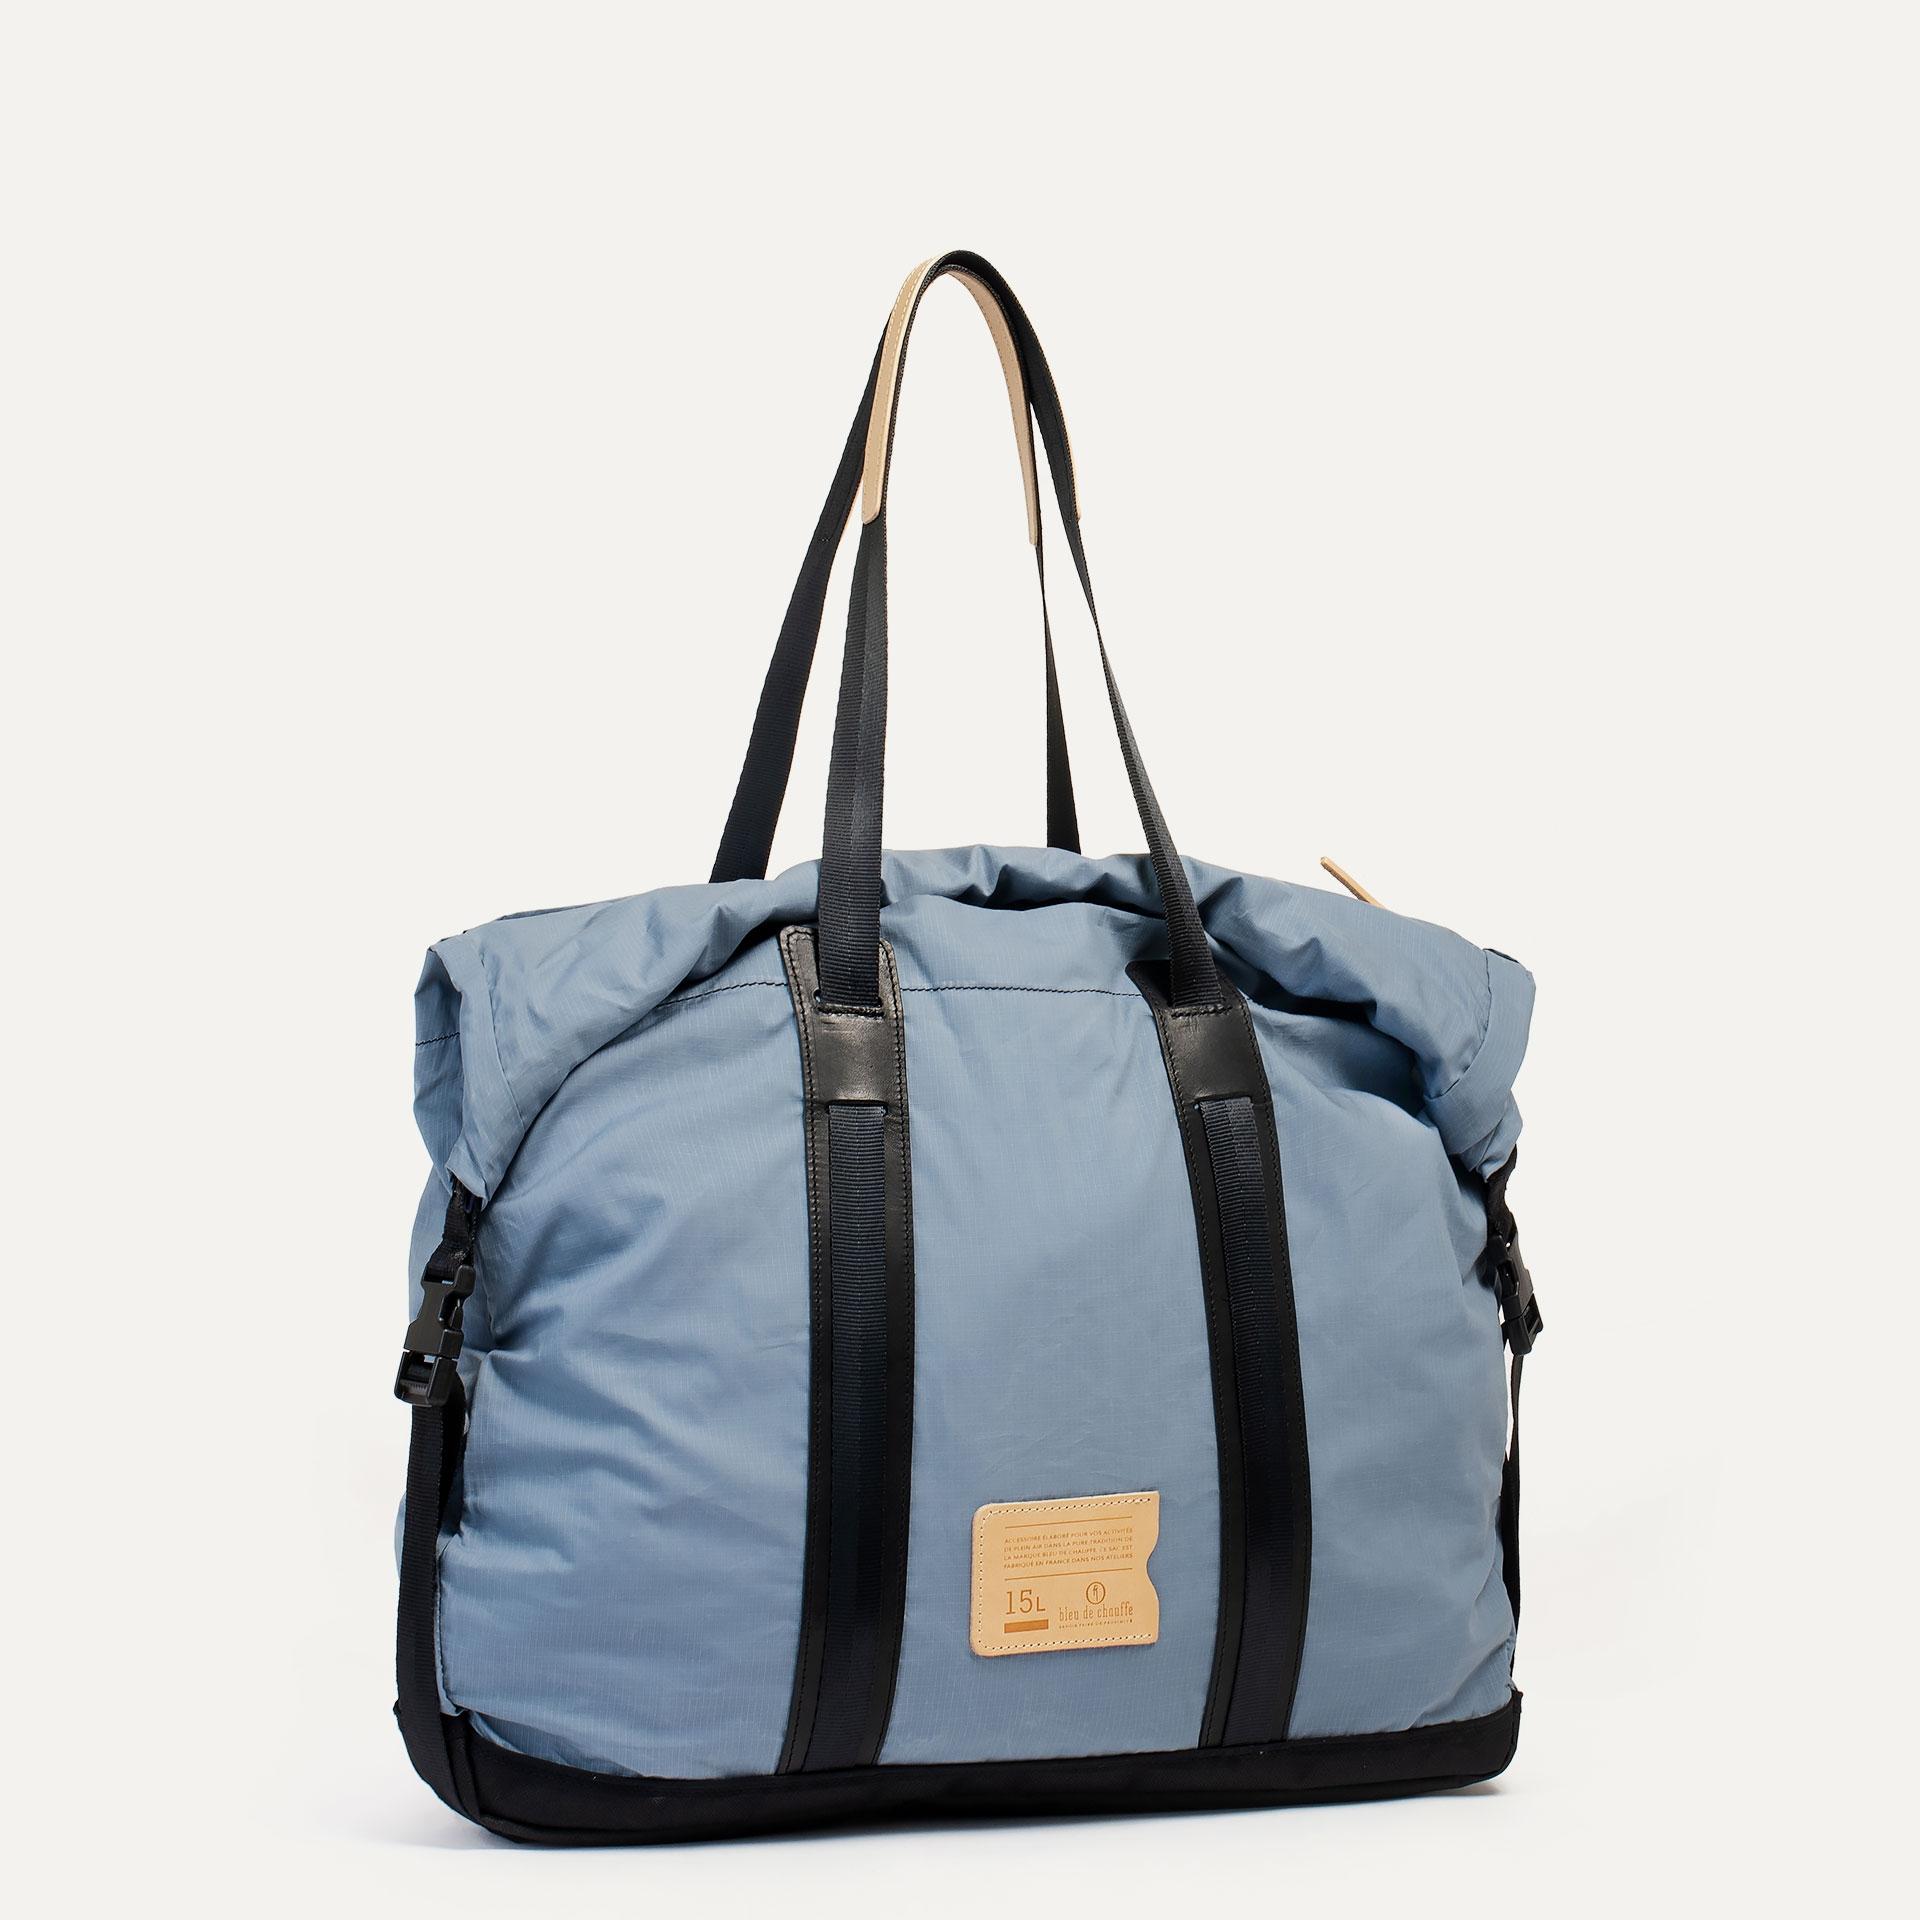 15L Barda Tote bag - blue grey (image n°2)